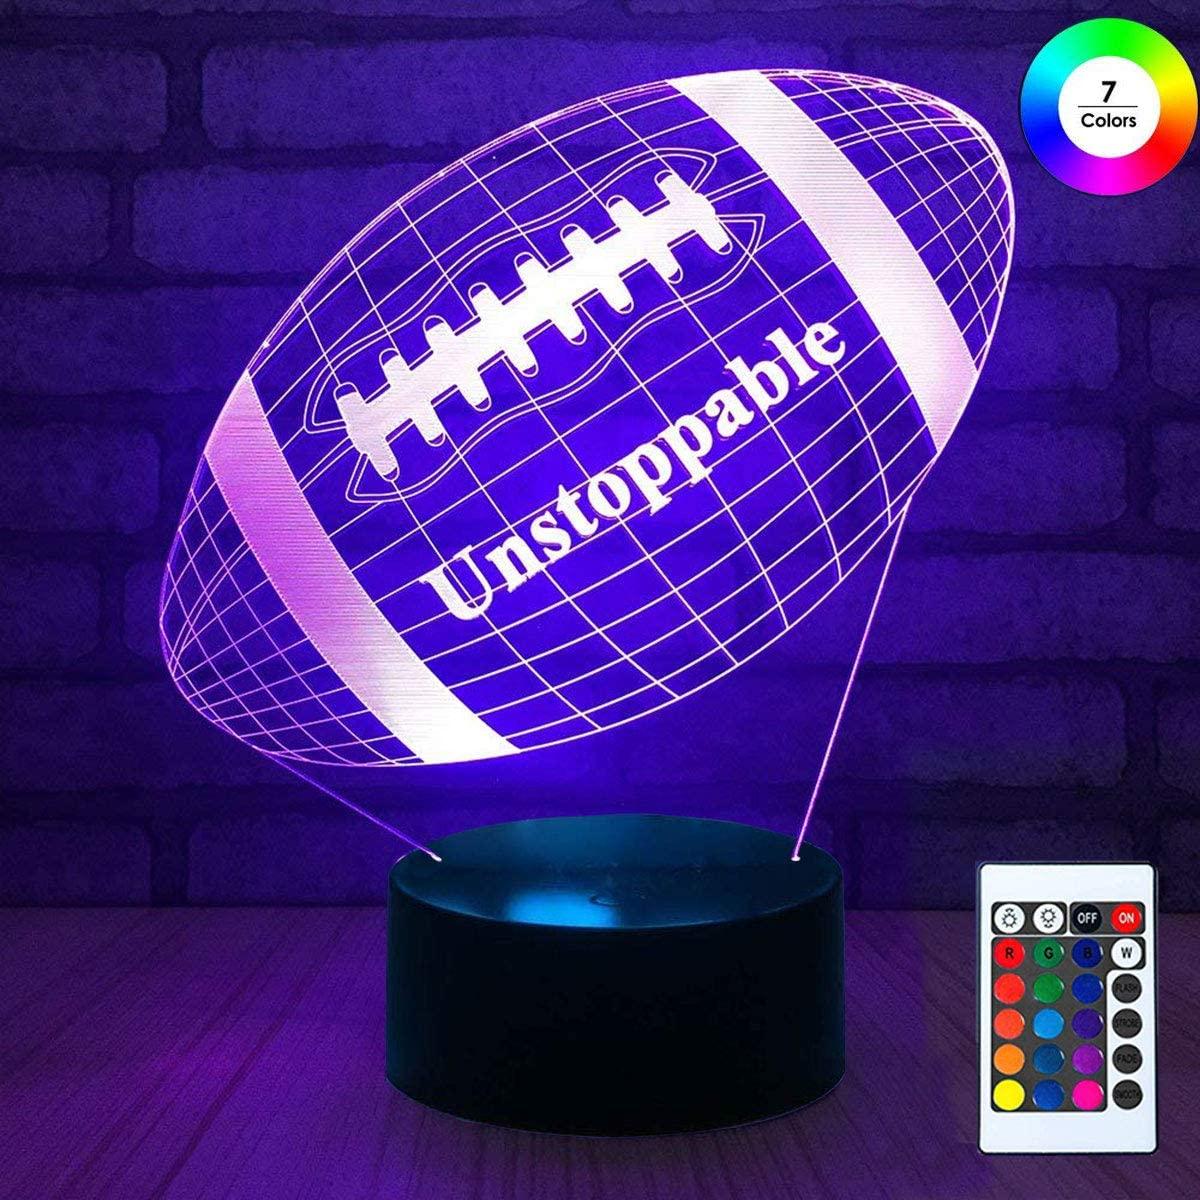 3D Remote Night Stand Light, EpicGadget Optical Illusion Visualization LED Night Light Lamp 7 Colors Changing Remote Control Night Light Lamp Stand (Football)